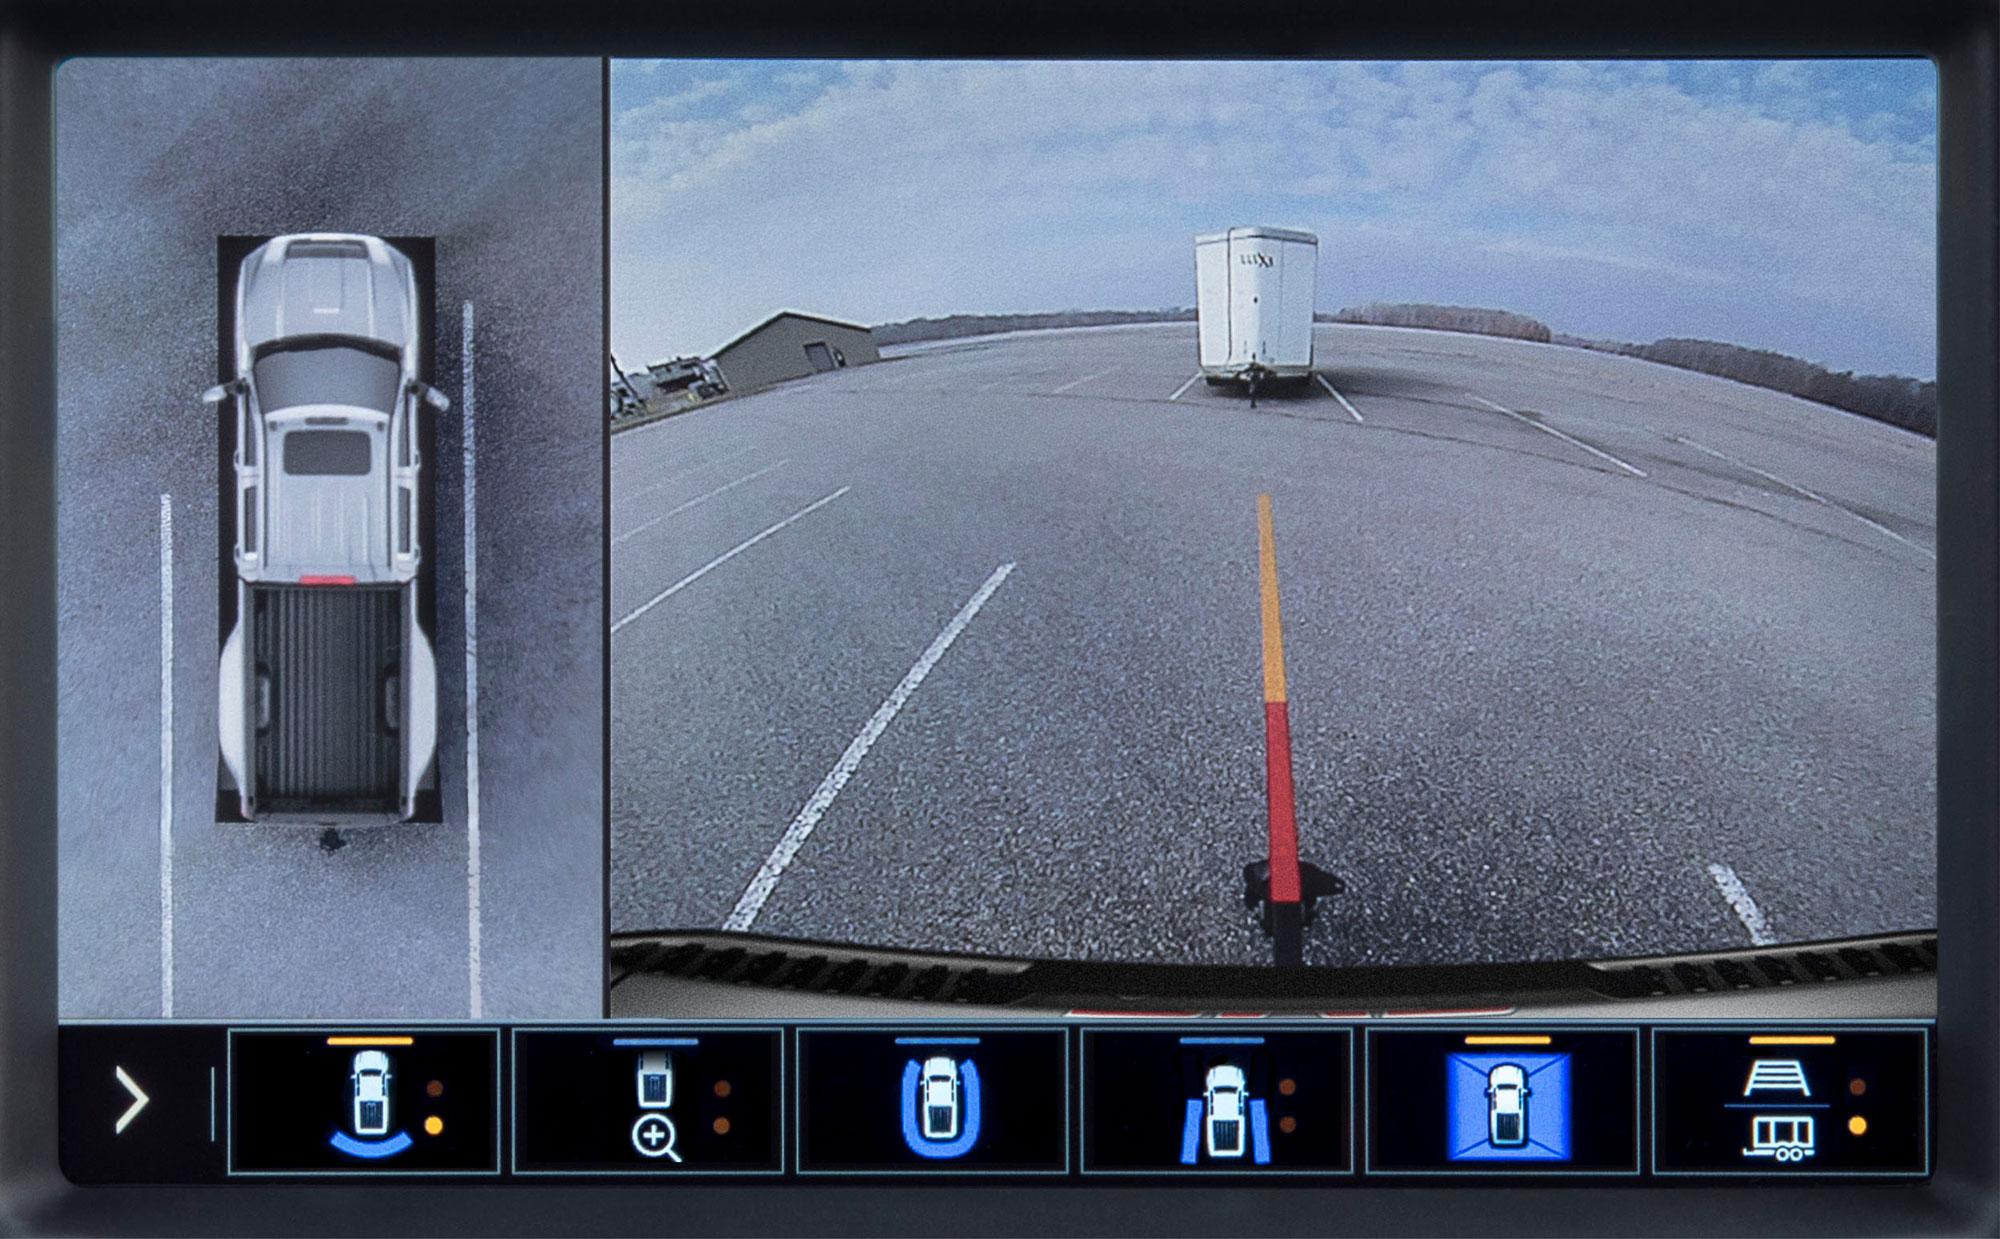 2020 GMC Sierra HD Transparent Trailer View backup camera